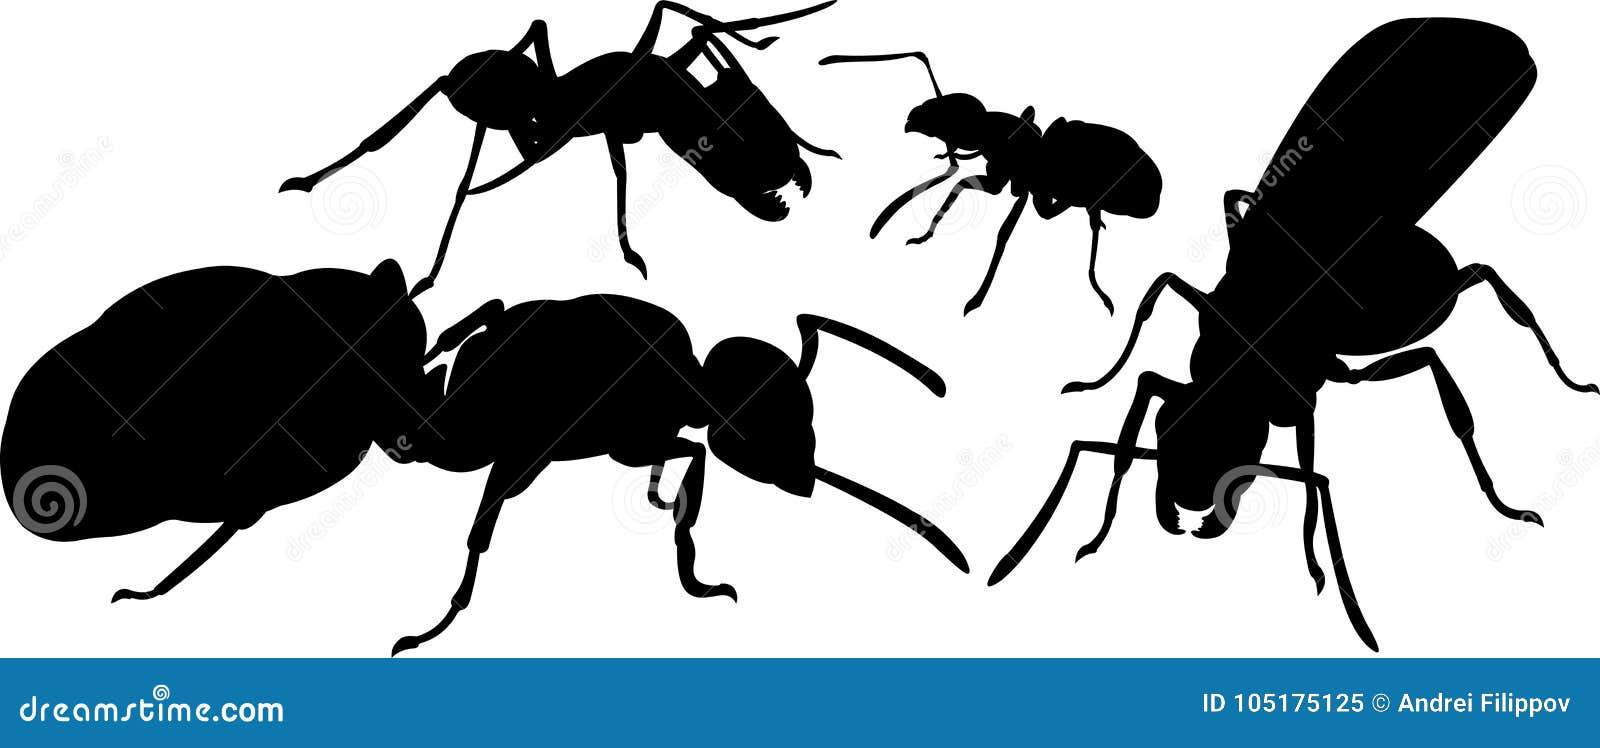 Silhuetas de formigas diferentes